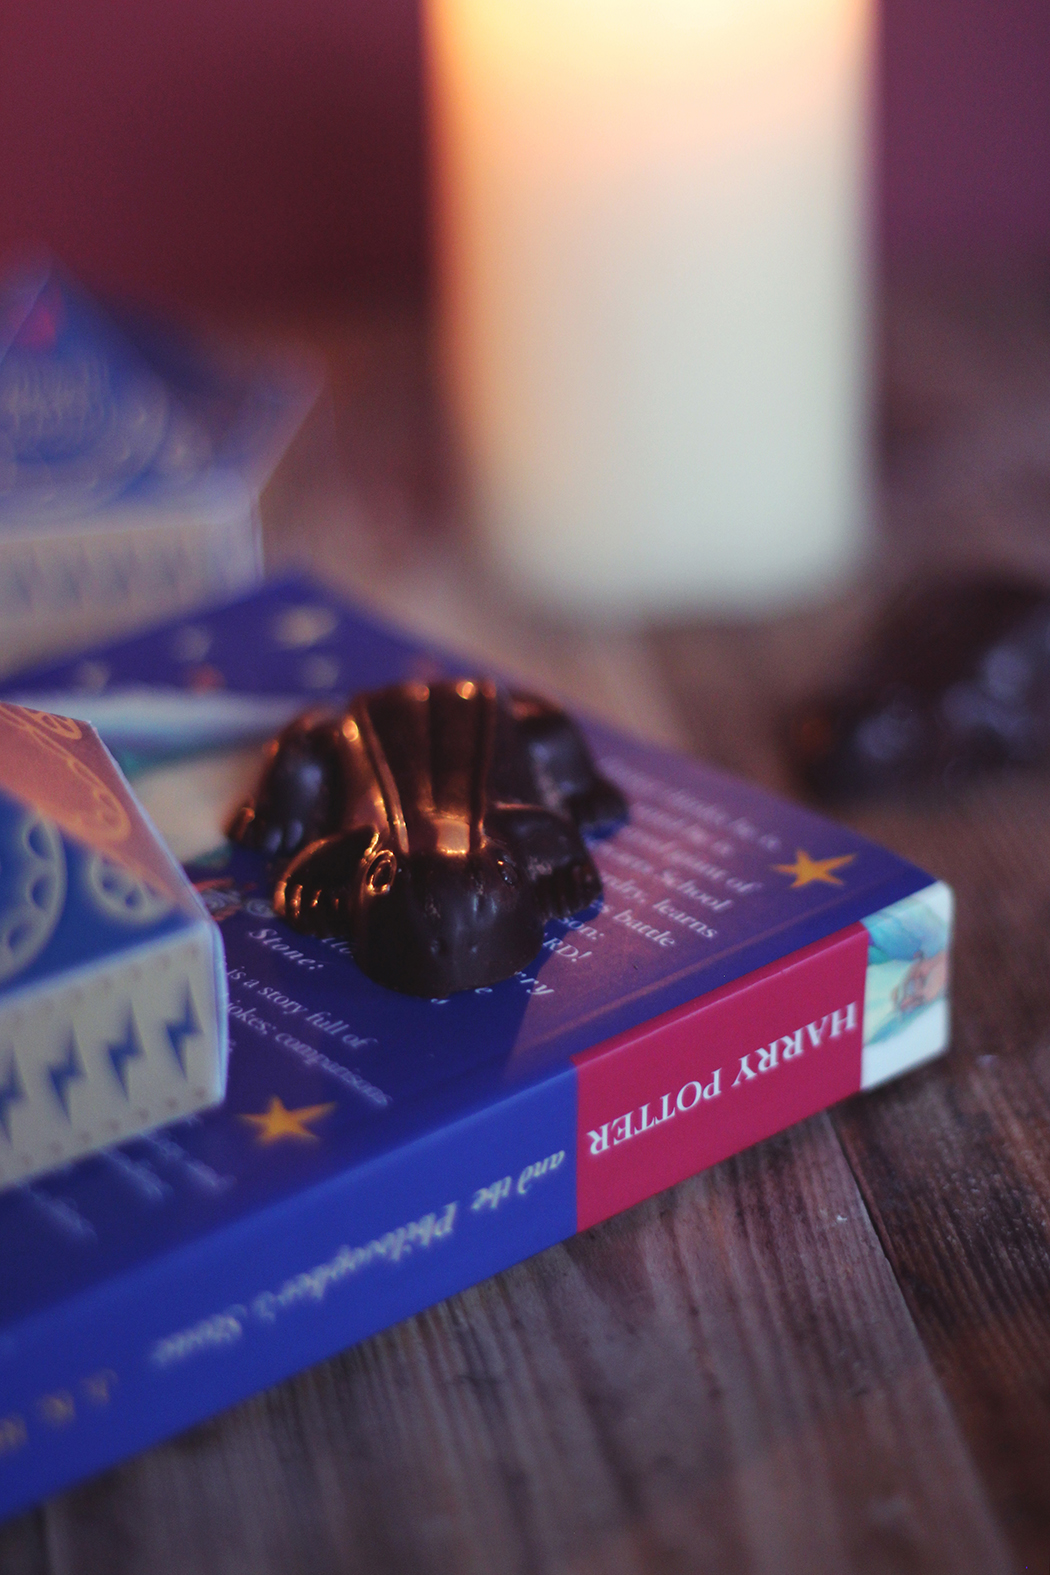 Recette Chocogrenouille - Chocolate frog Harry Potter - Juliette Blog féminin